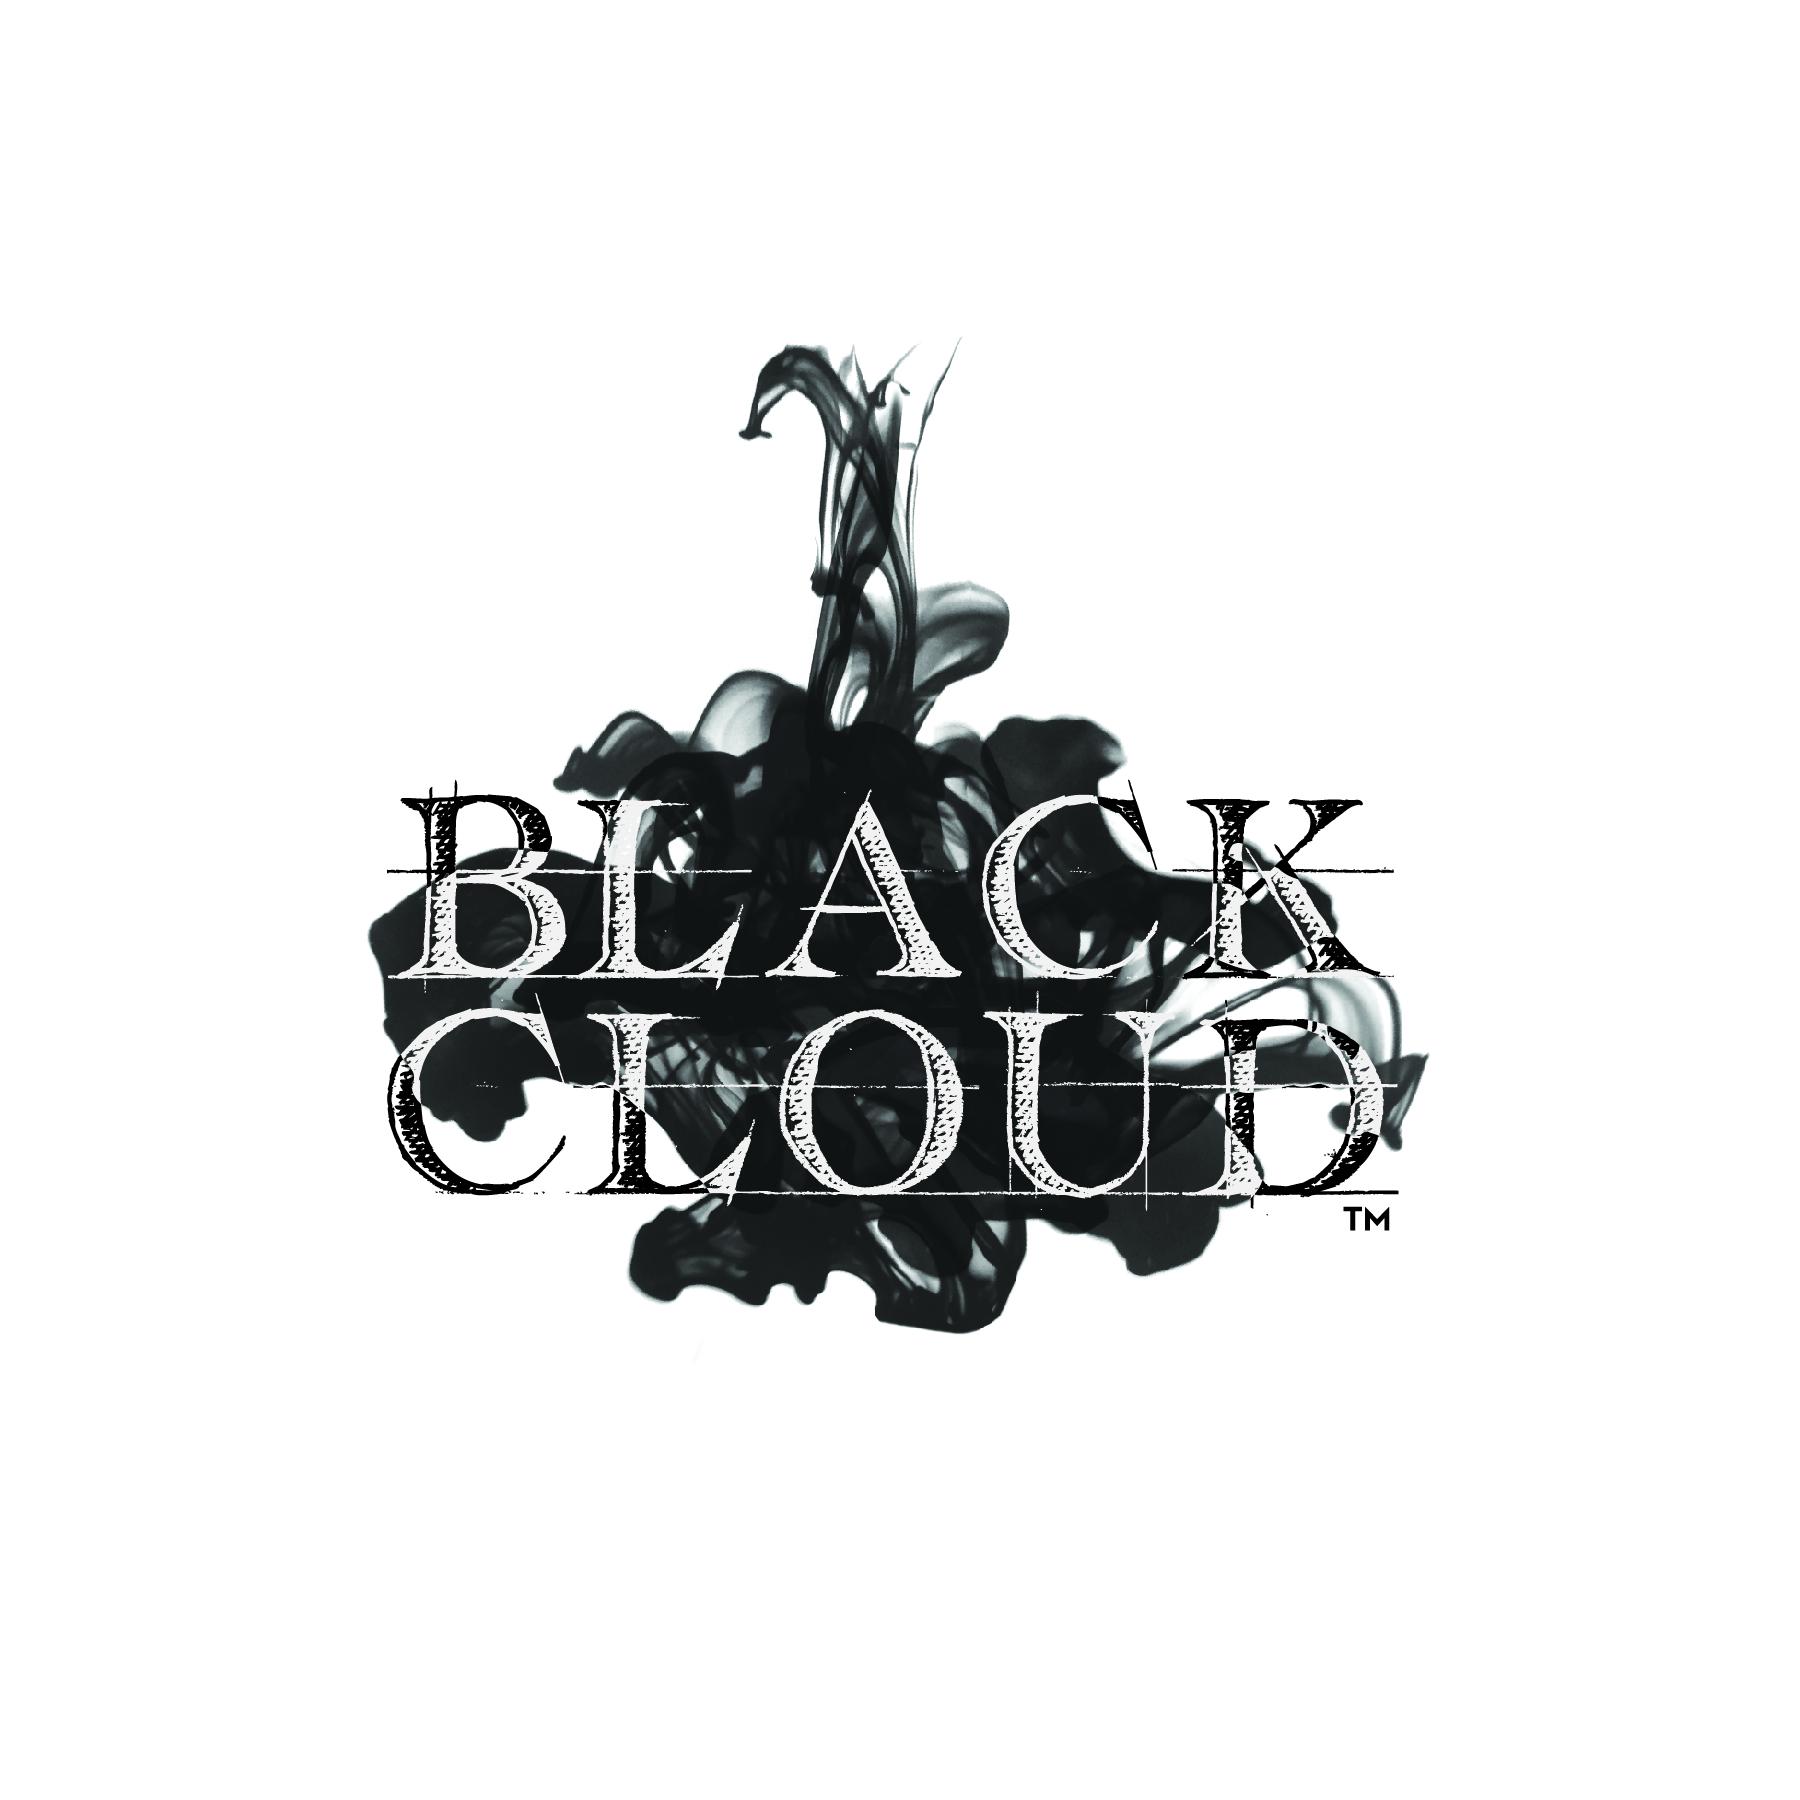 BlackCloud_logo_032315-01.jpg